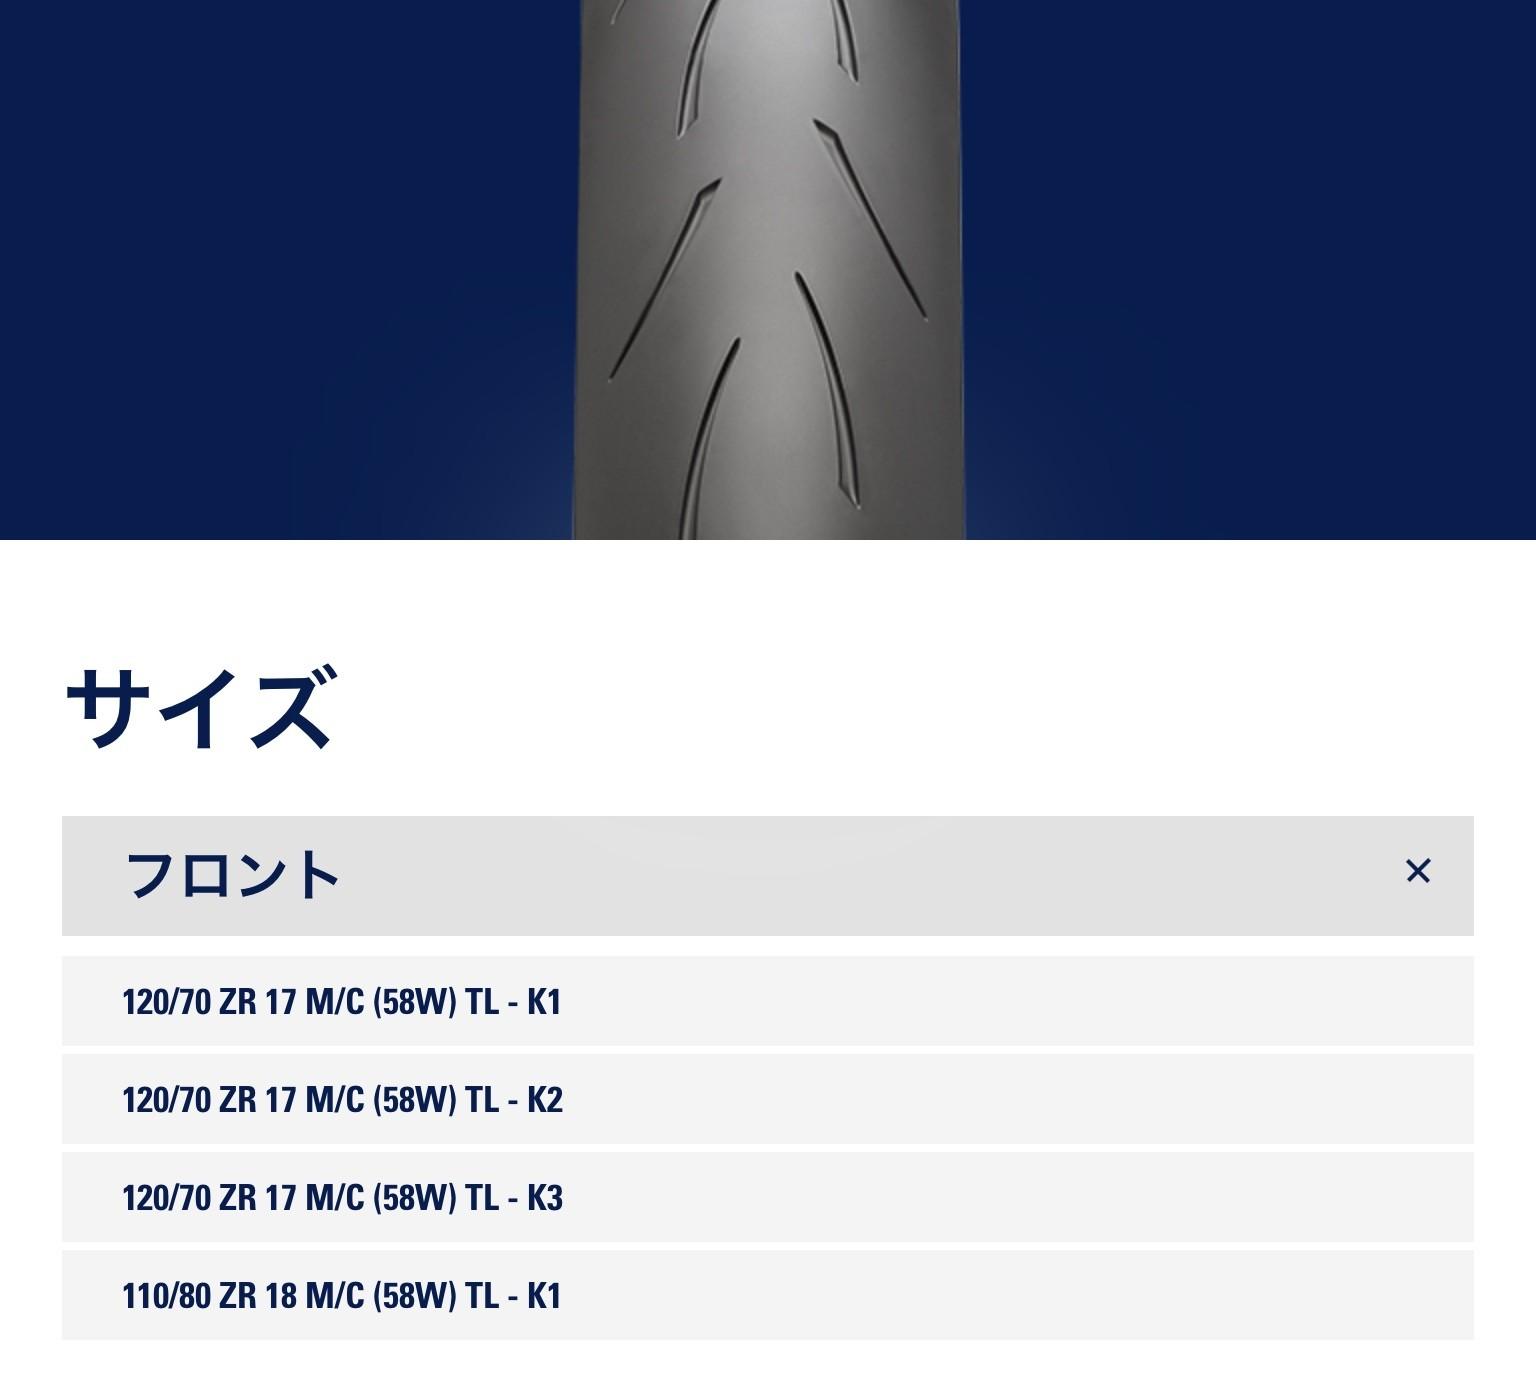 9B63DC09-6AD7-4A03-A38A-ABCDFBD40526